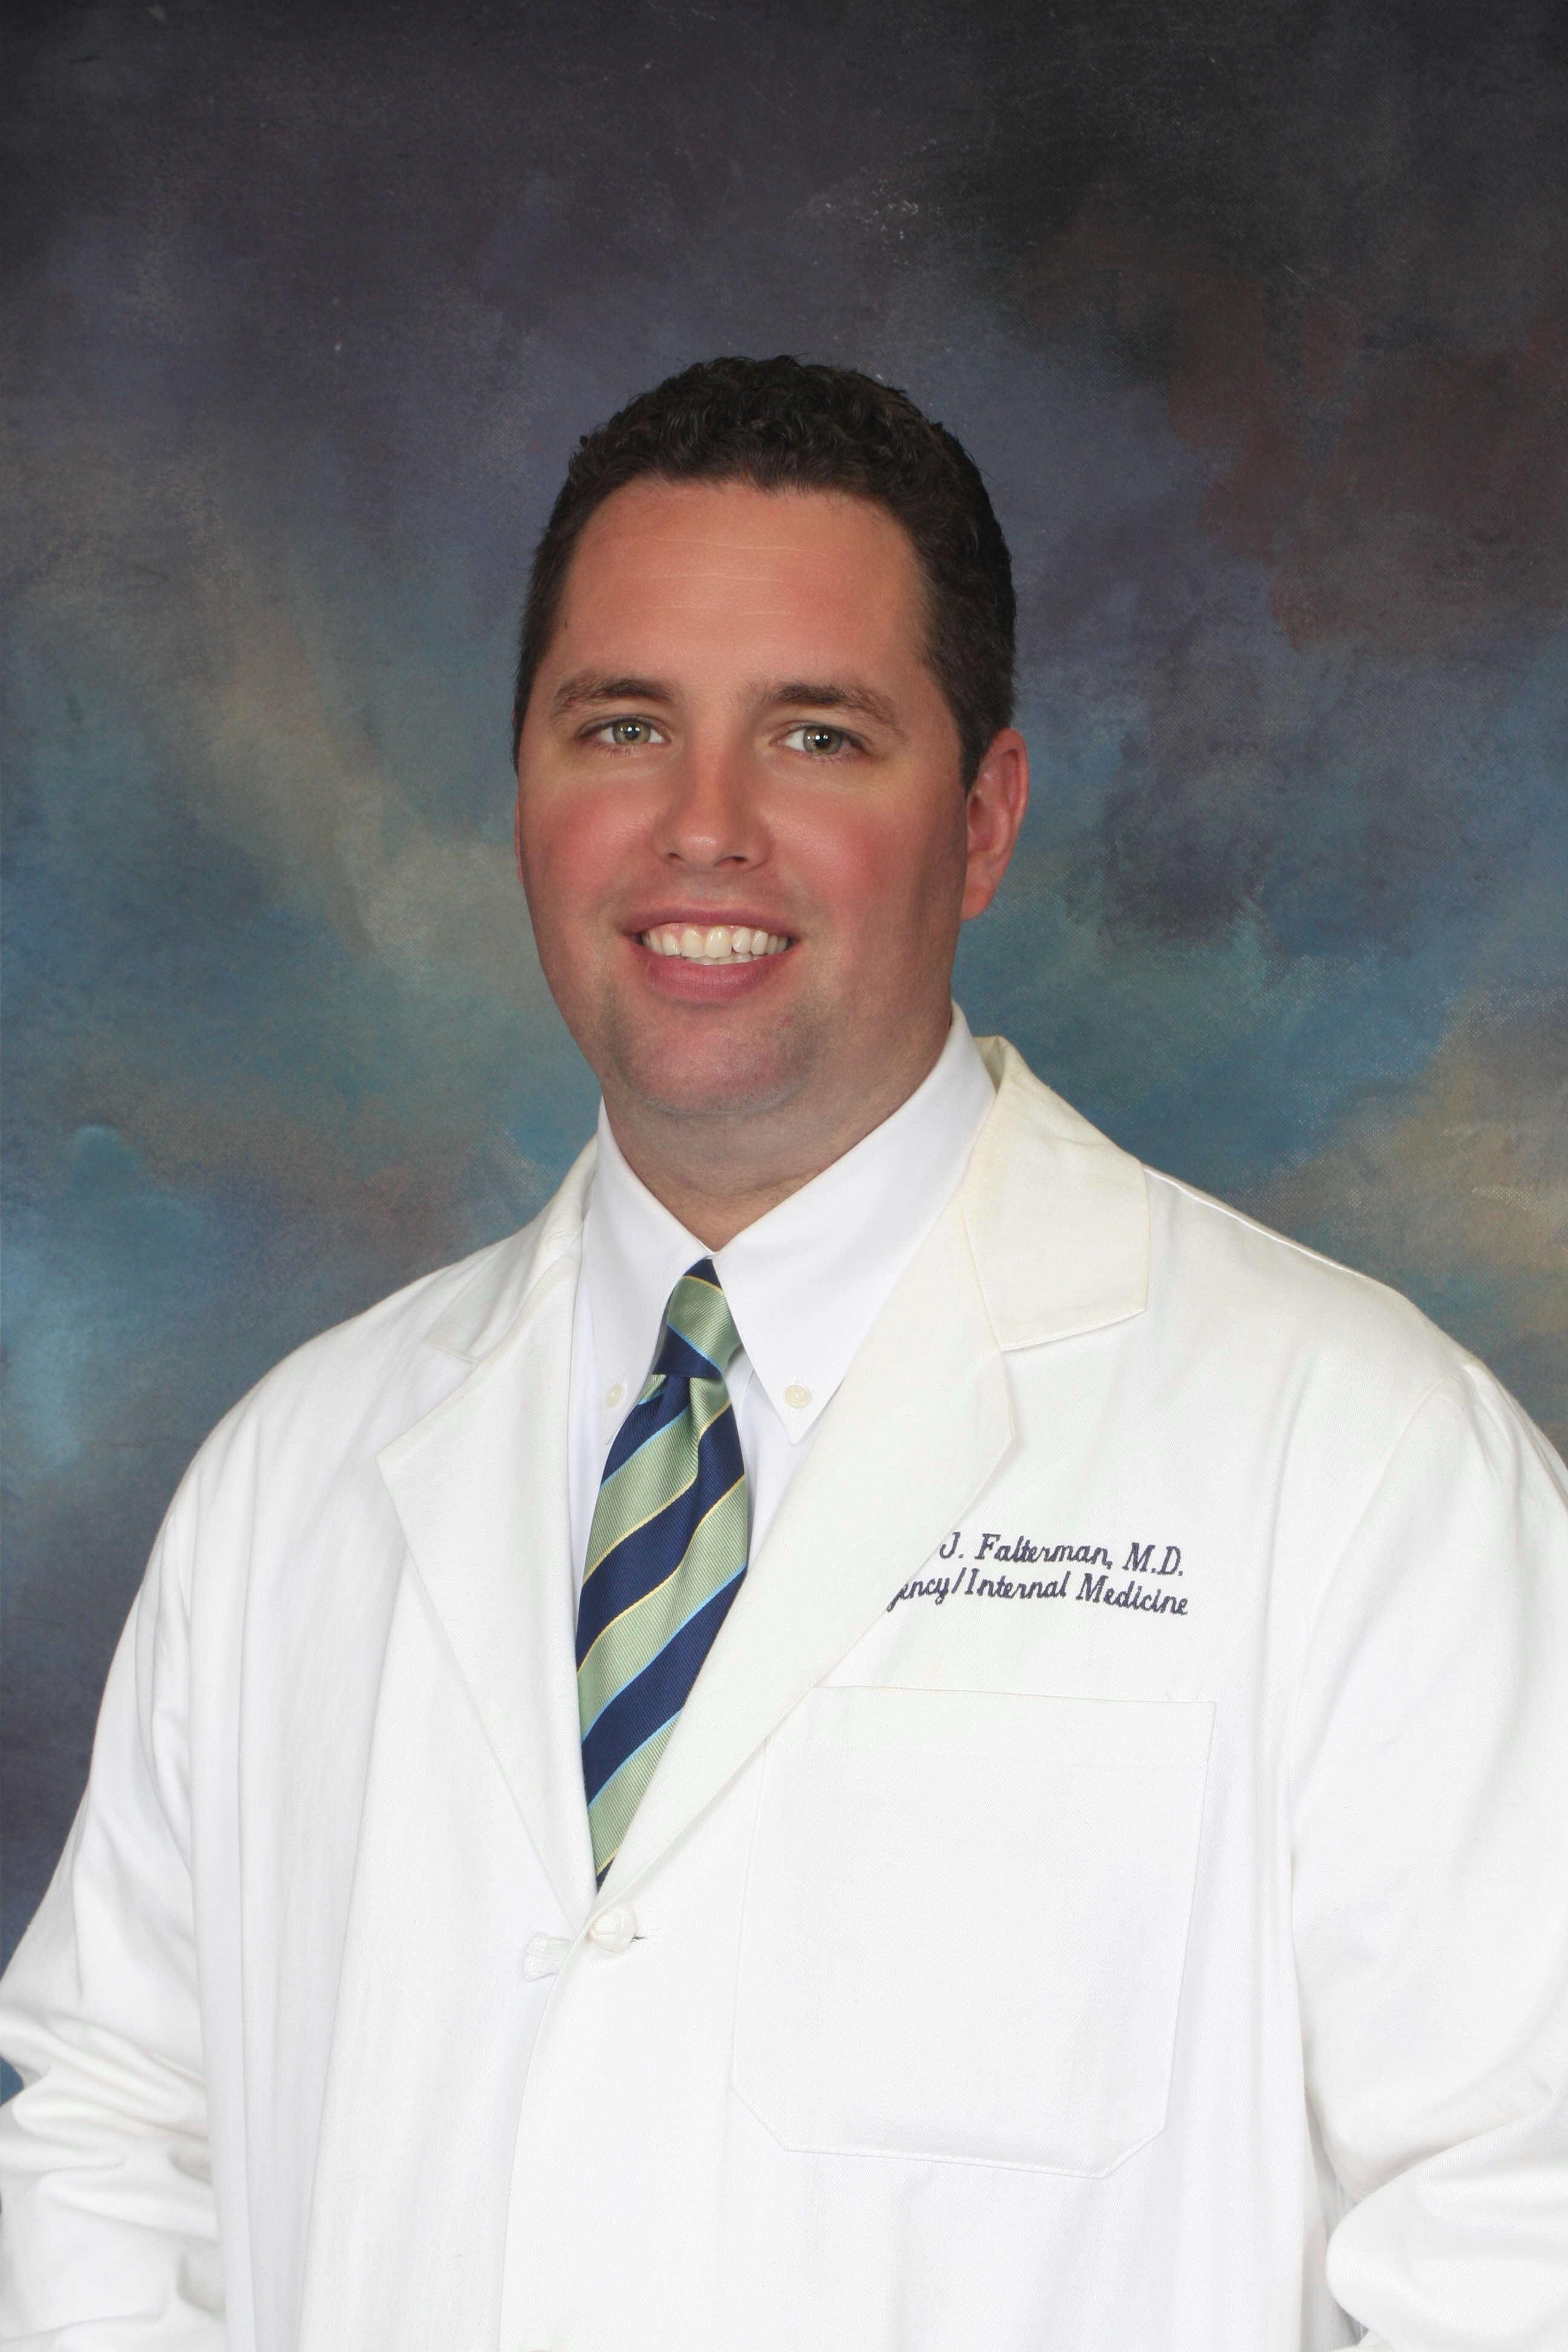 Thomas J Falterman, MD Emergency Medicine